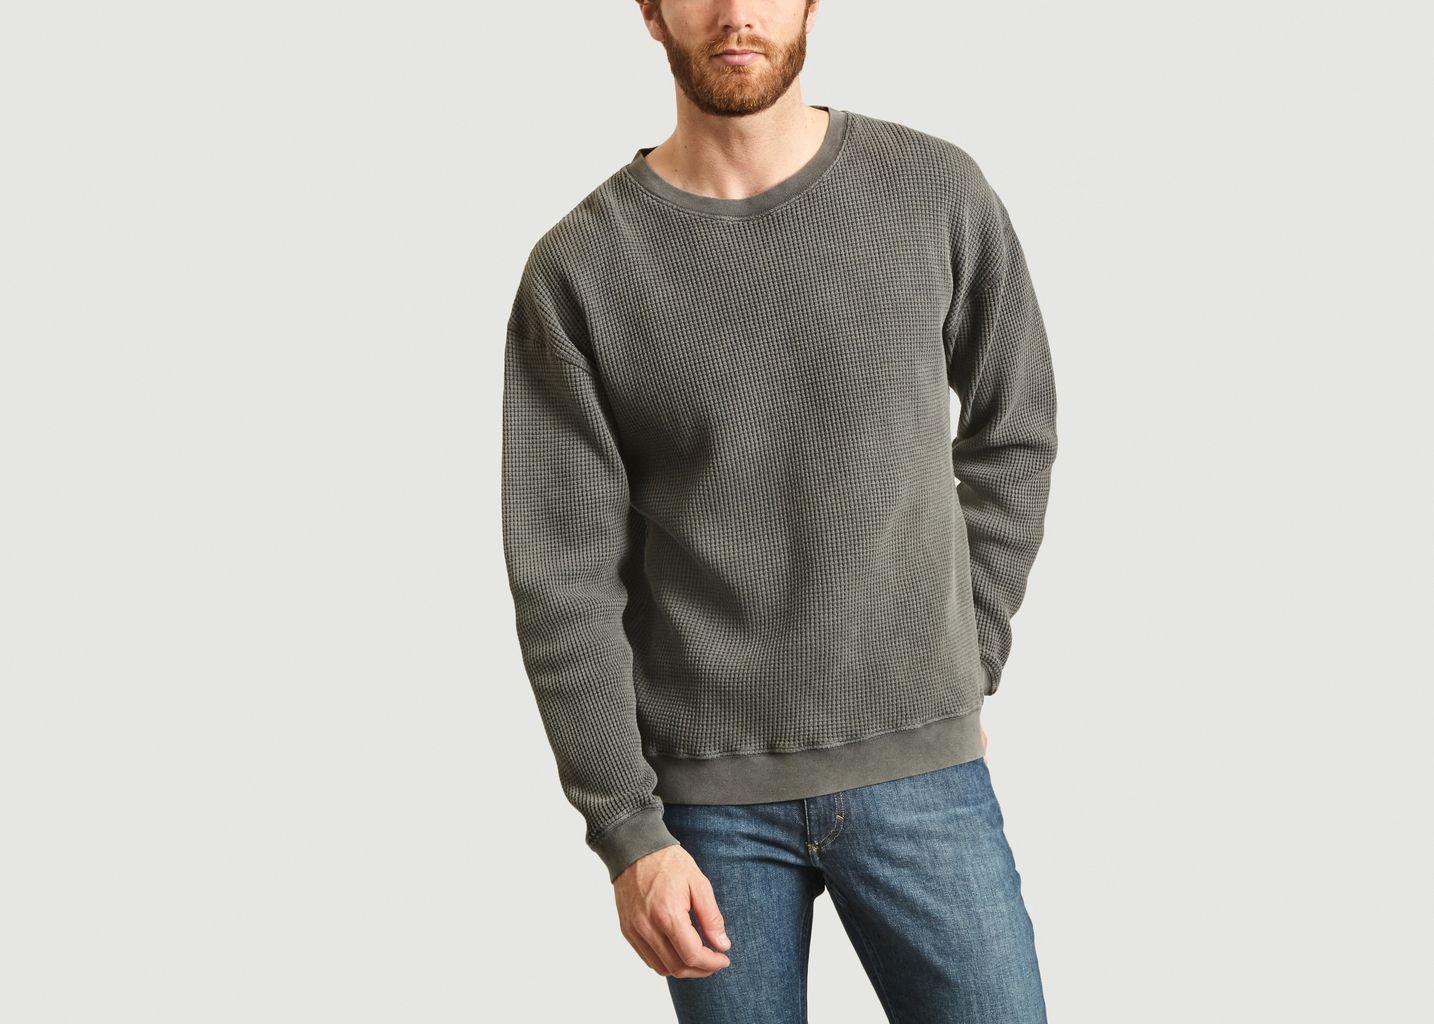 Sweatshirt Bowilove - American Vintage